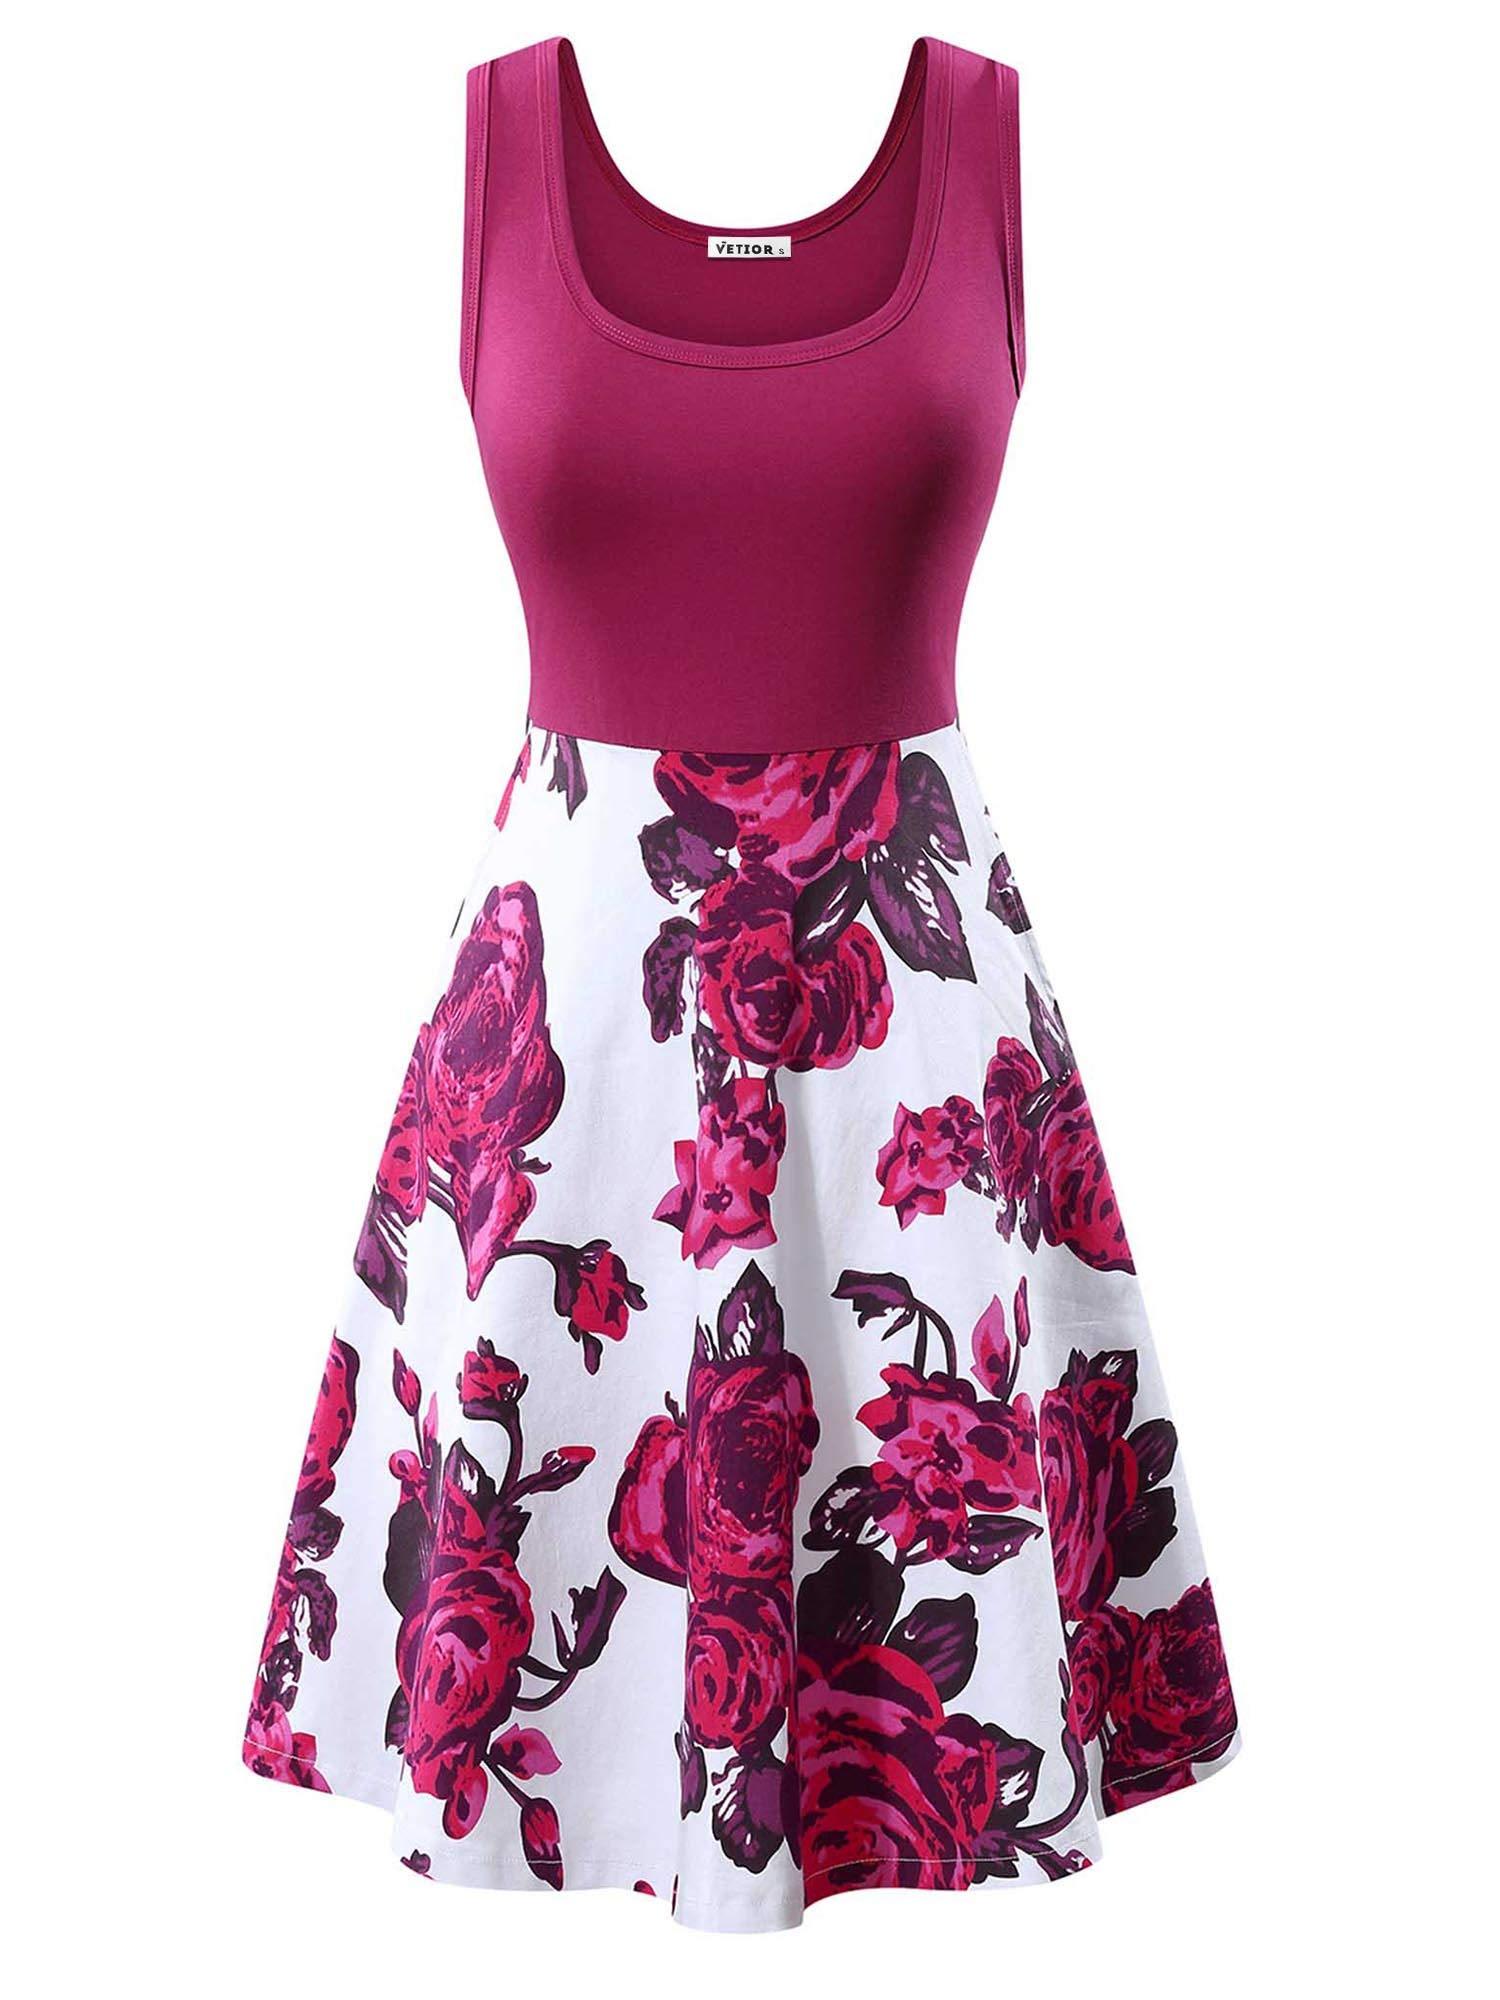 Vintage Scoop Neck Dress Sleeveless Midi Dress with Pockets VETIOR Flared Tank Dress